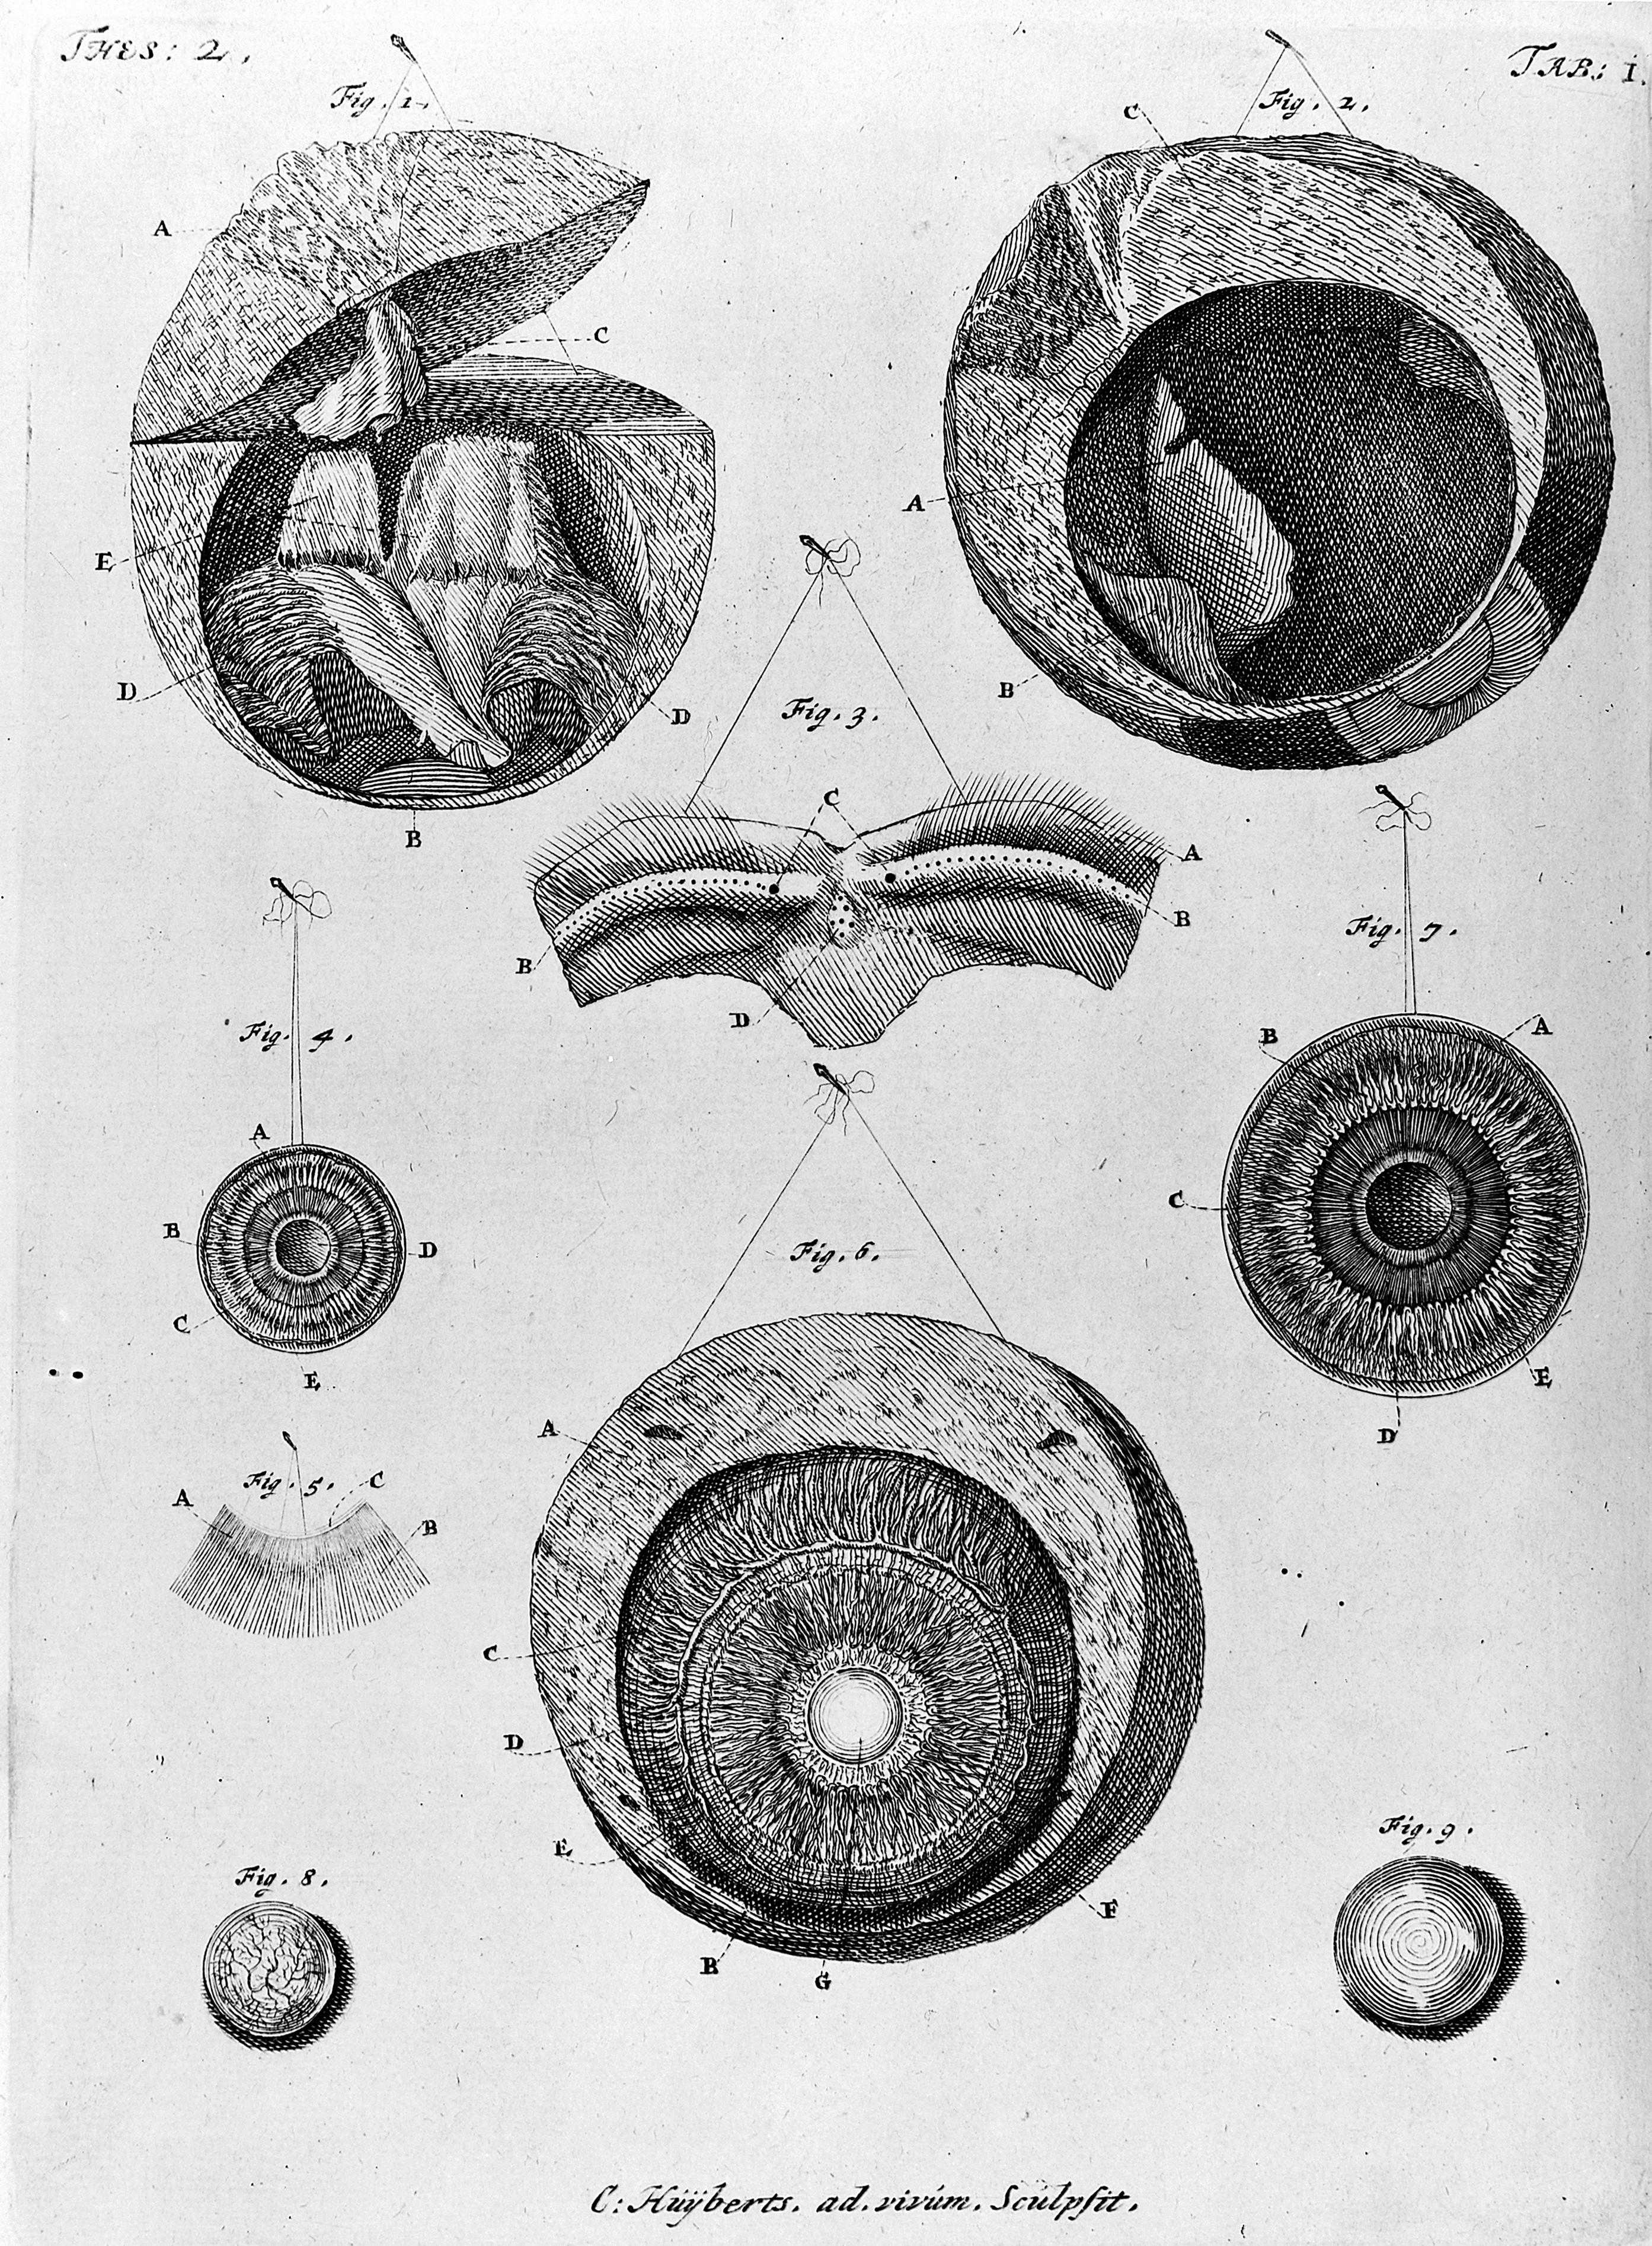 file anatomical drawings of the eye wellcome m0011086 jpg